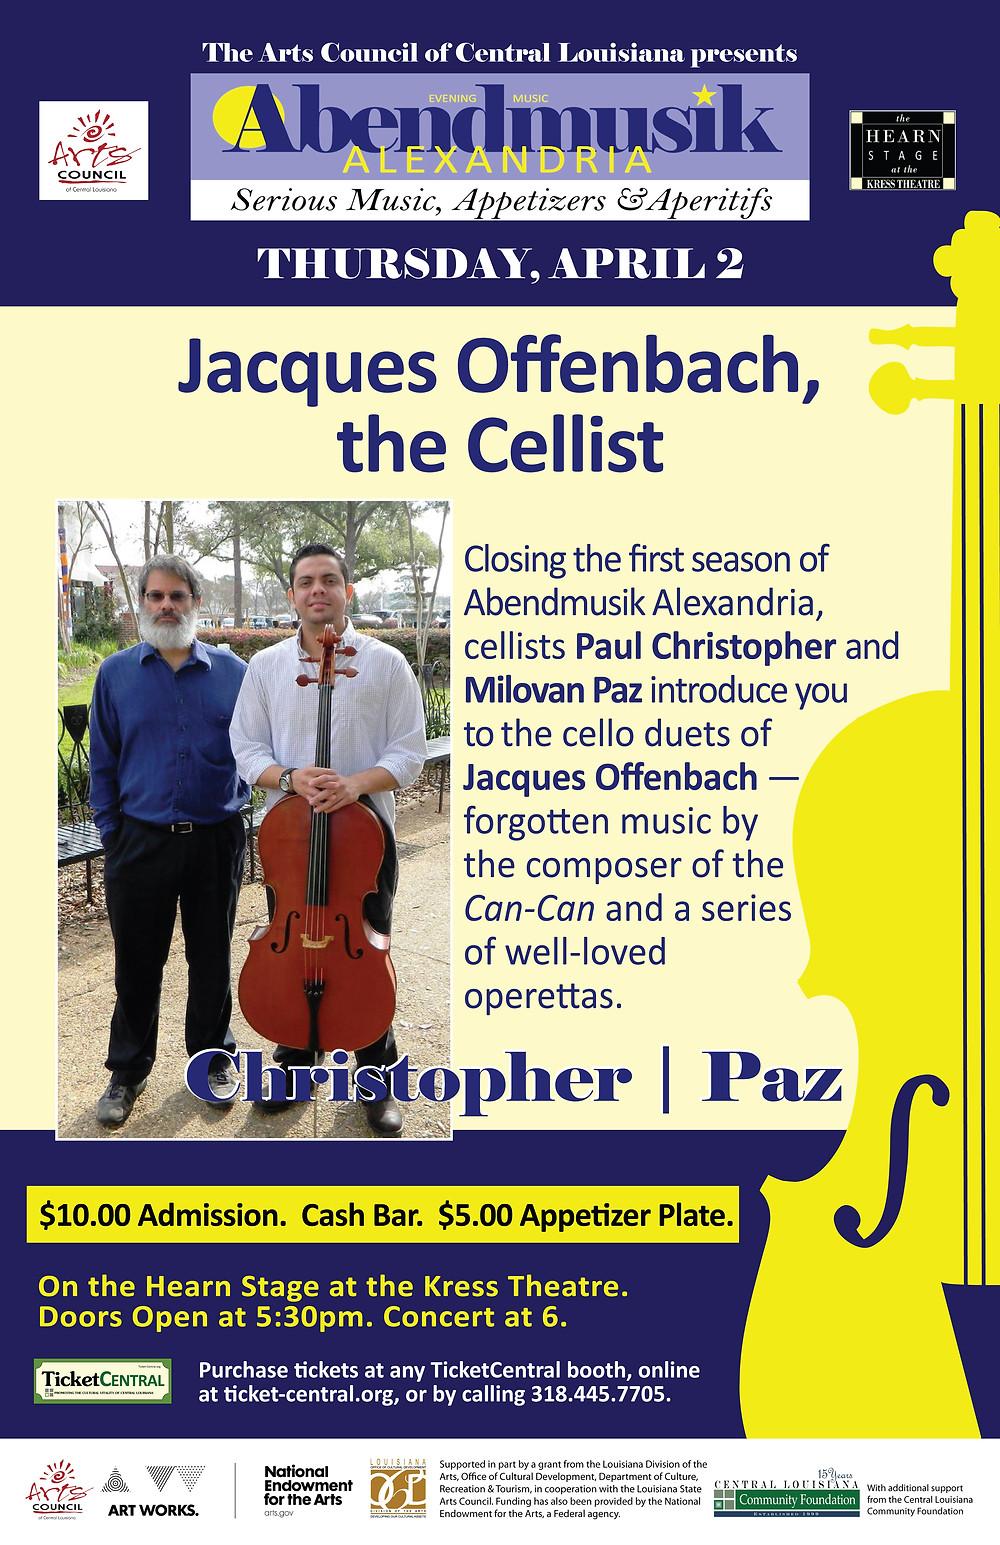 Jacques Offenbach Abendmusik Alexandria